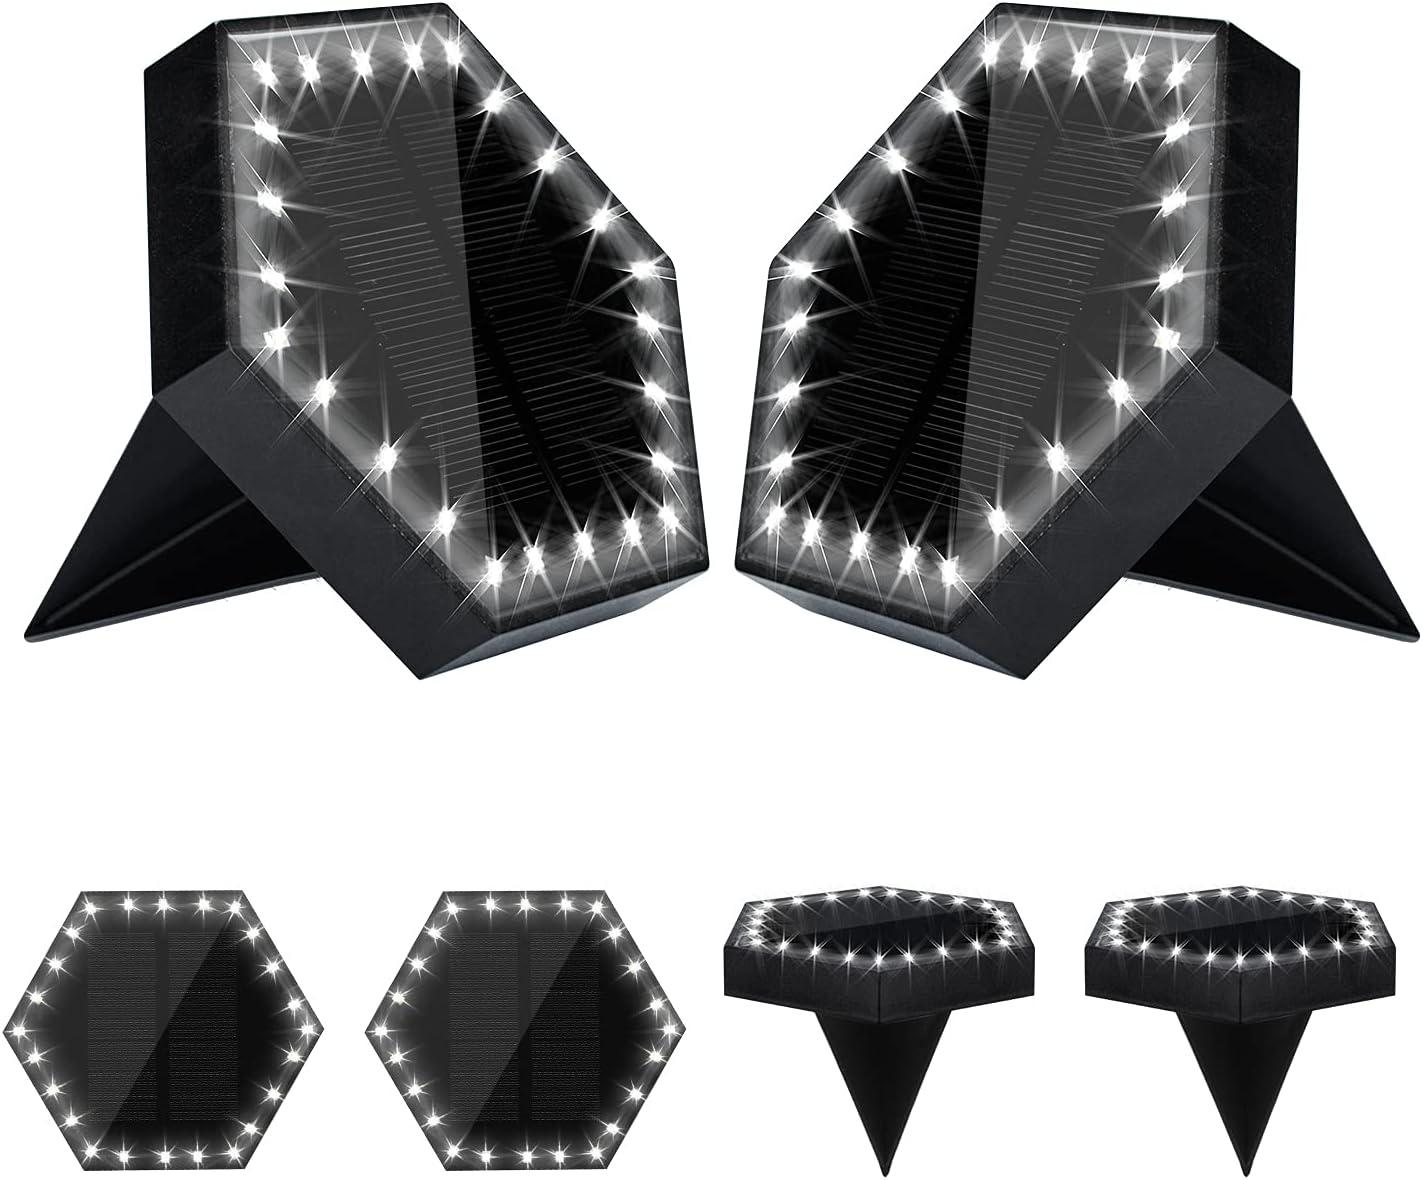 Solar Ground Light Max 59% OFF 24 LED Outdoor Disk 4 years warranty Hexagonal Lights